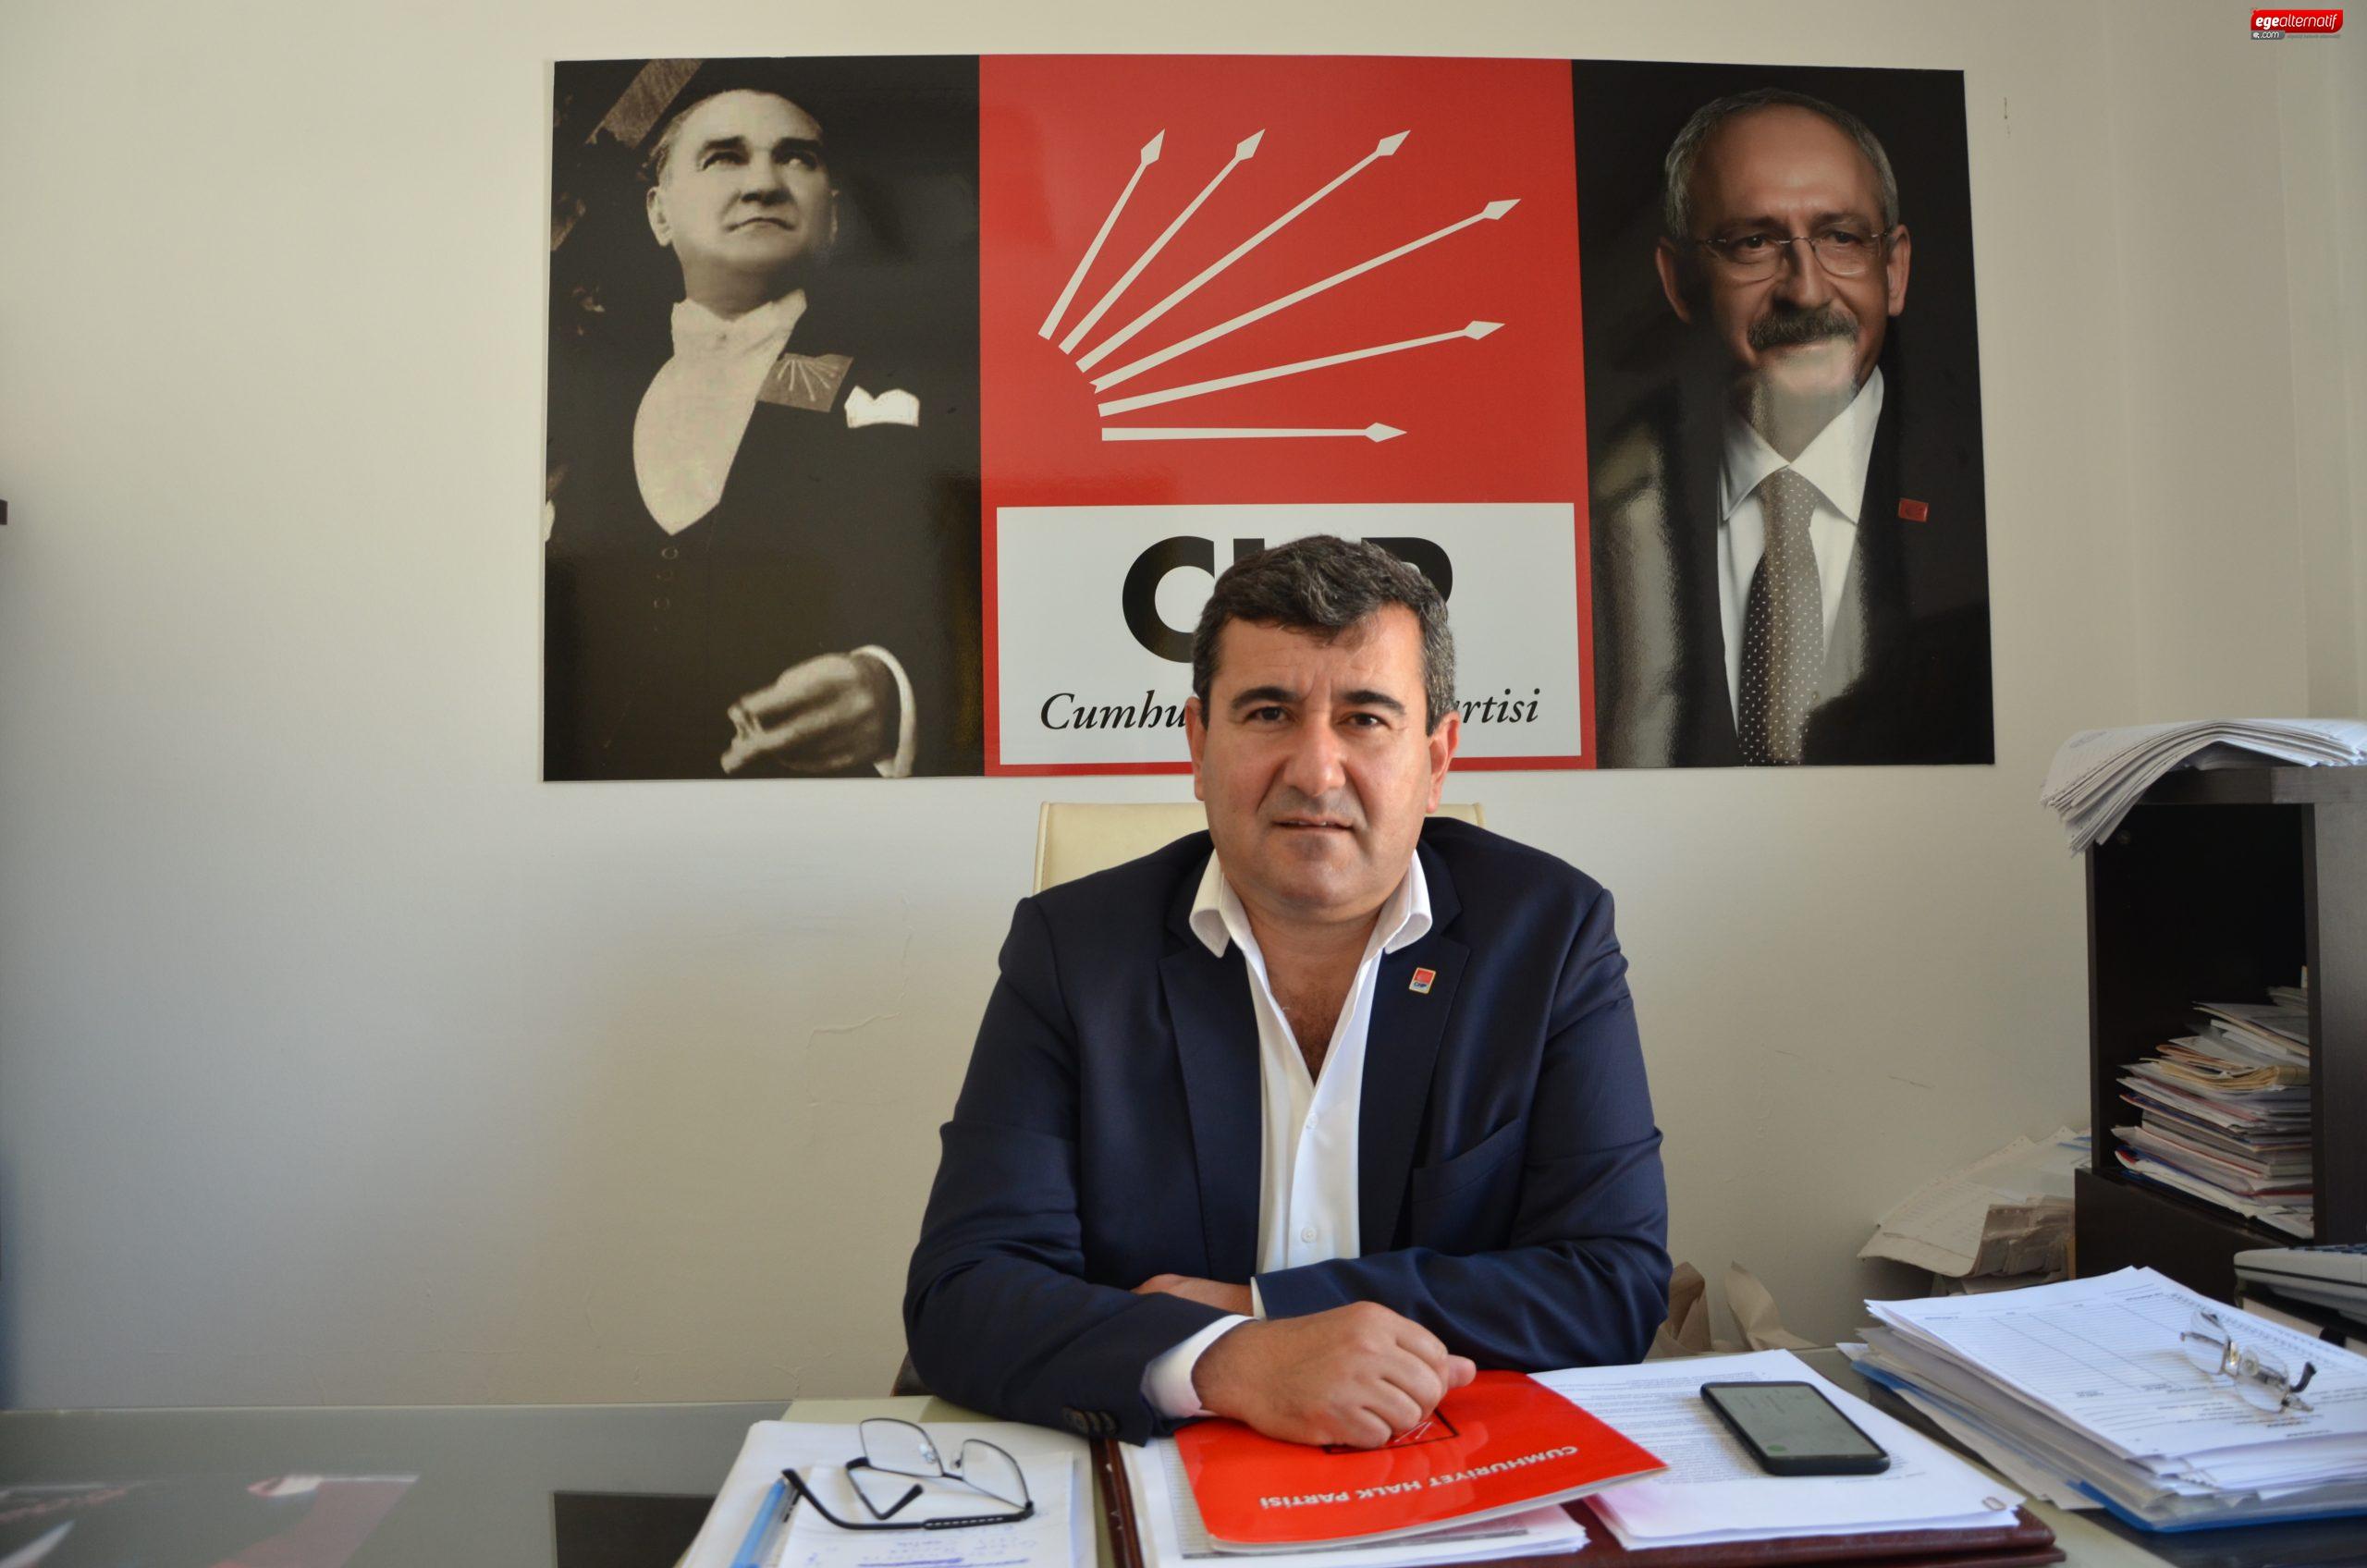 CHP'den AK Parti'ye Çözüm Süreci Eleştirisi!